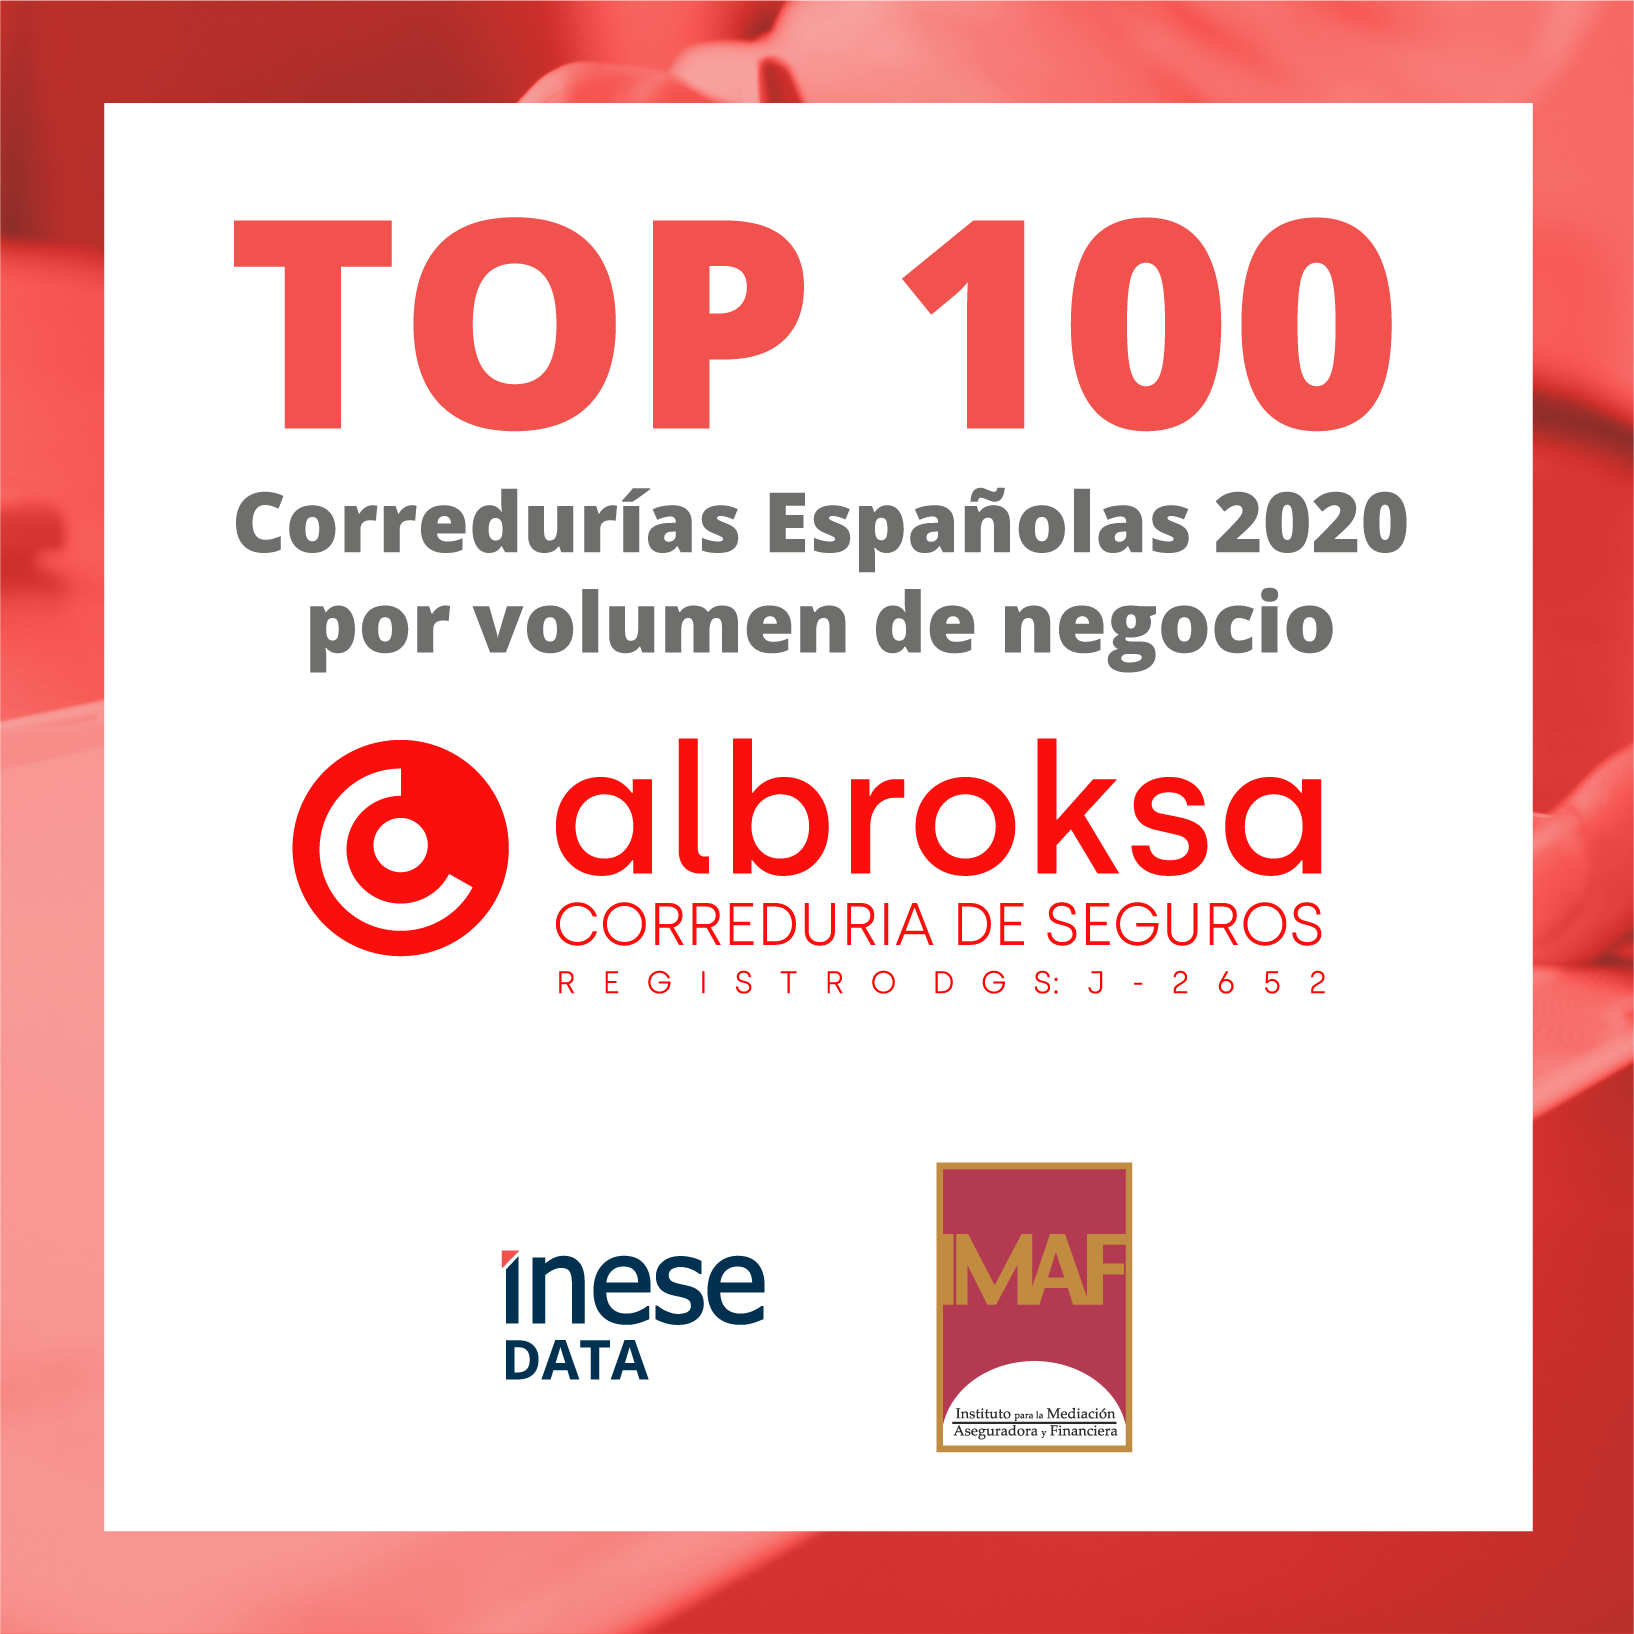 top 100 corredurias